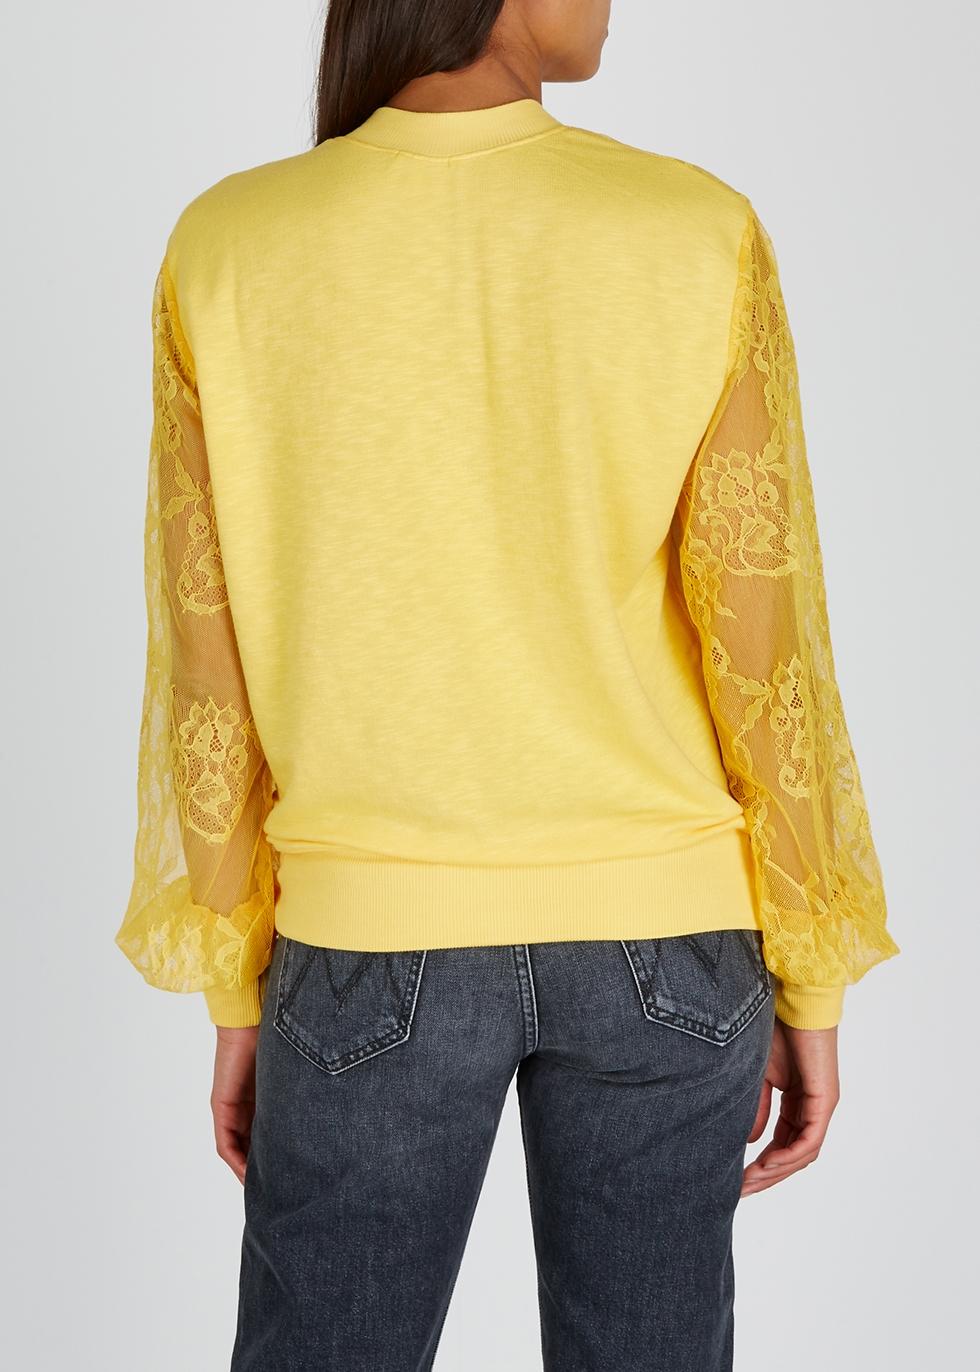 Yellow lace sweatshirt - Clu